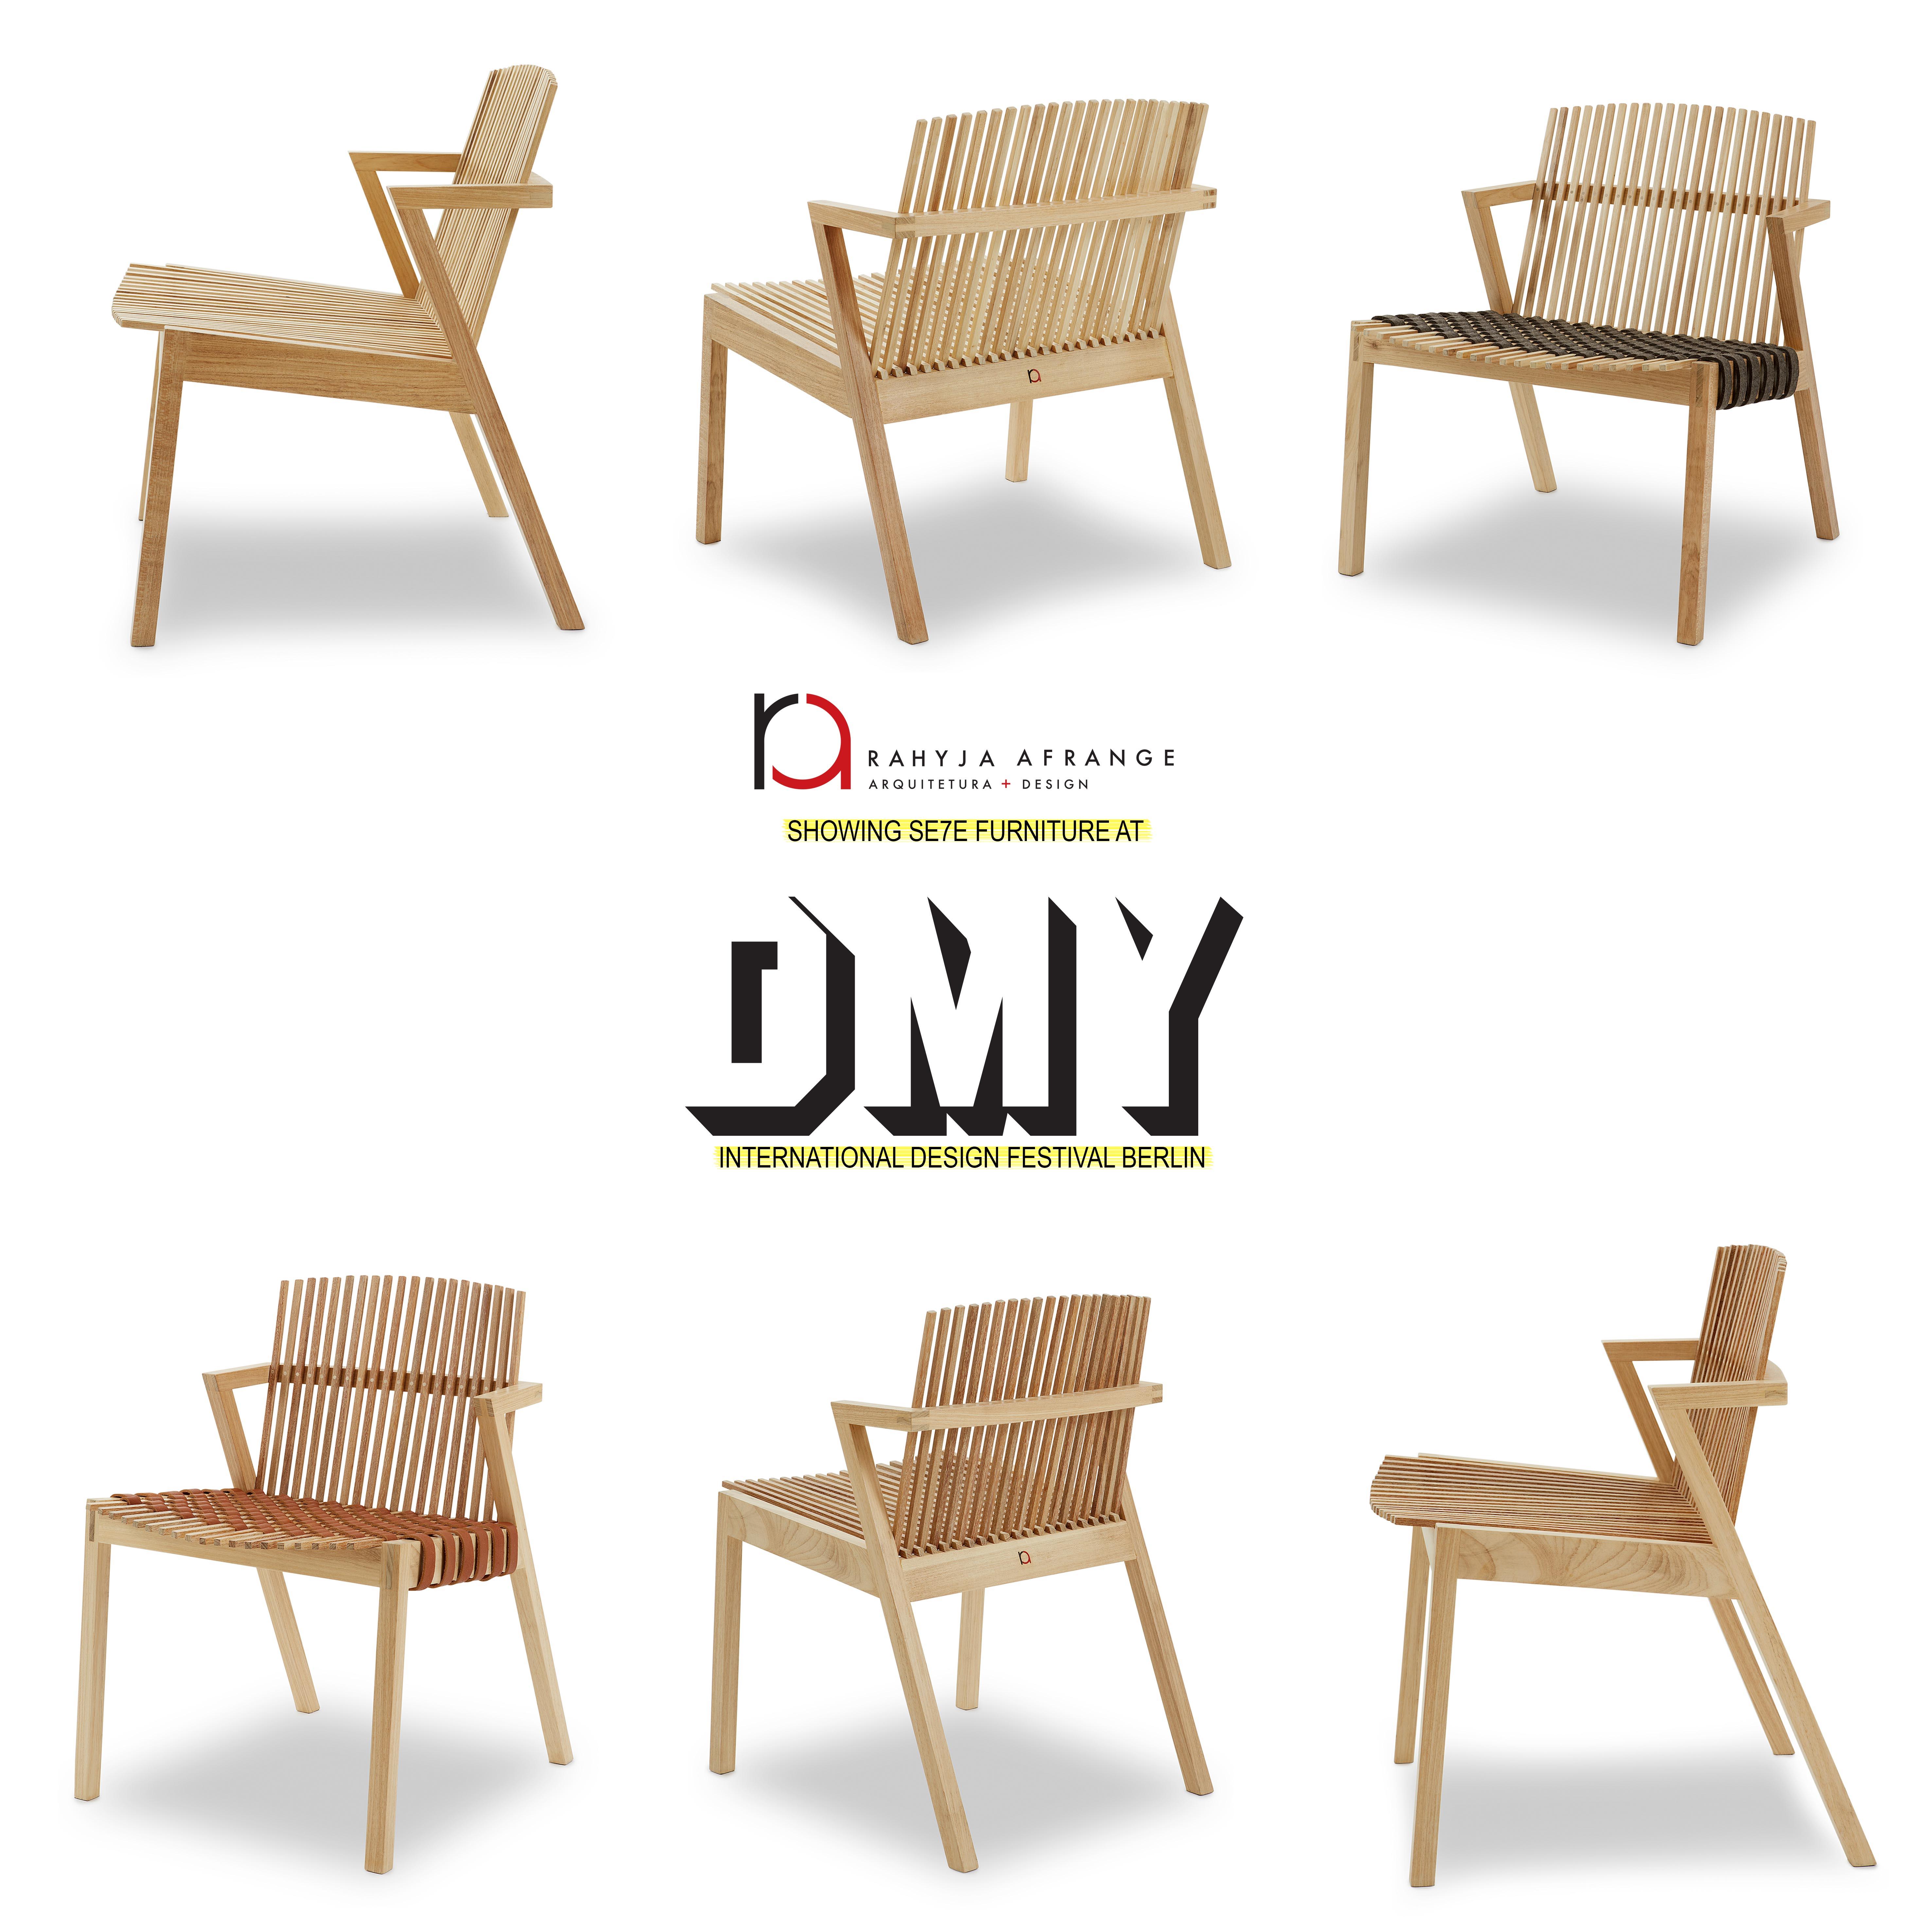 DMY-SE7E